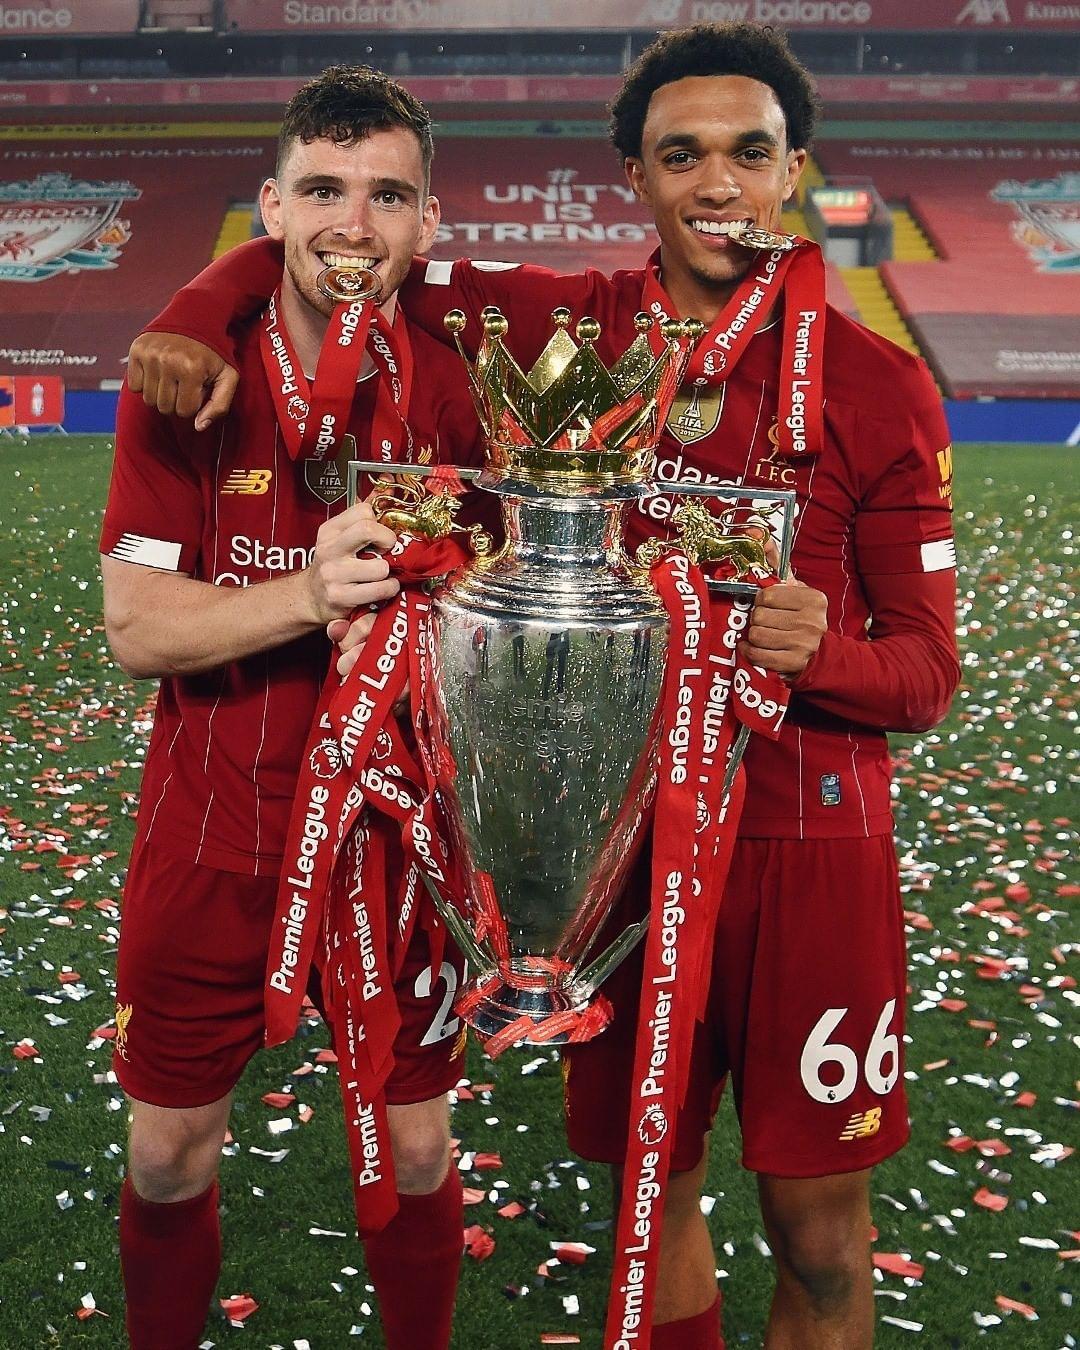 Liverpool Football Club On Instagram Our Premierleague Winning Full Backs Lfcchampions L In 2020 Liverpool Football Liverpool Football Club Liverpool Champions